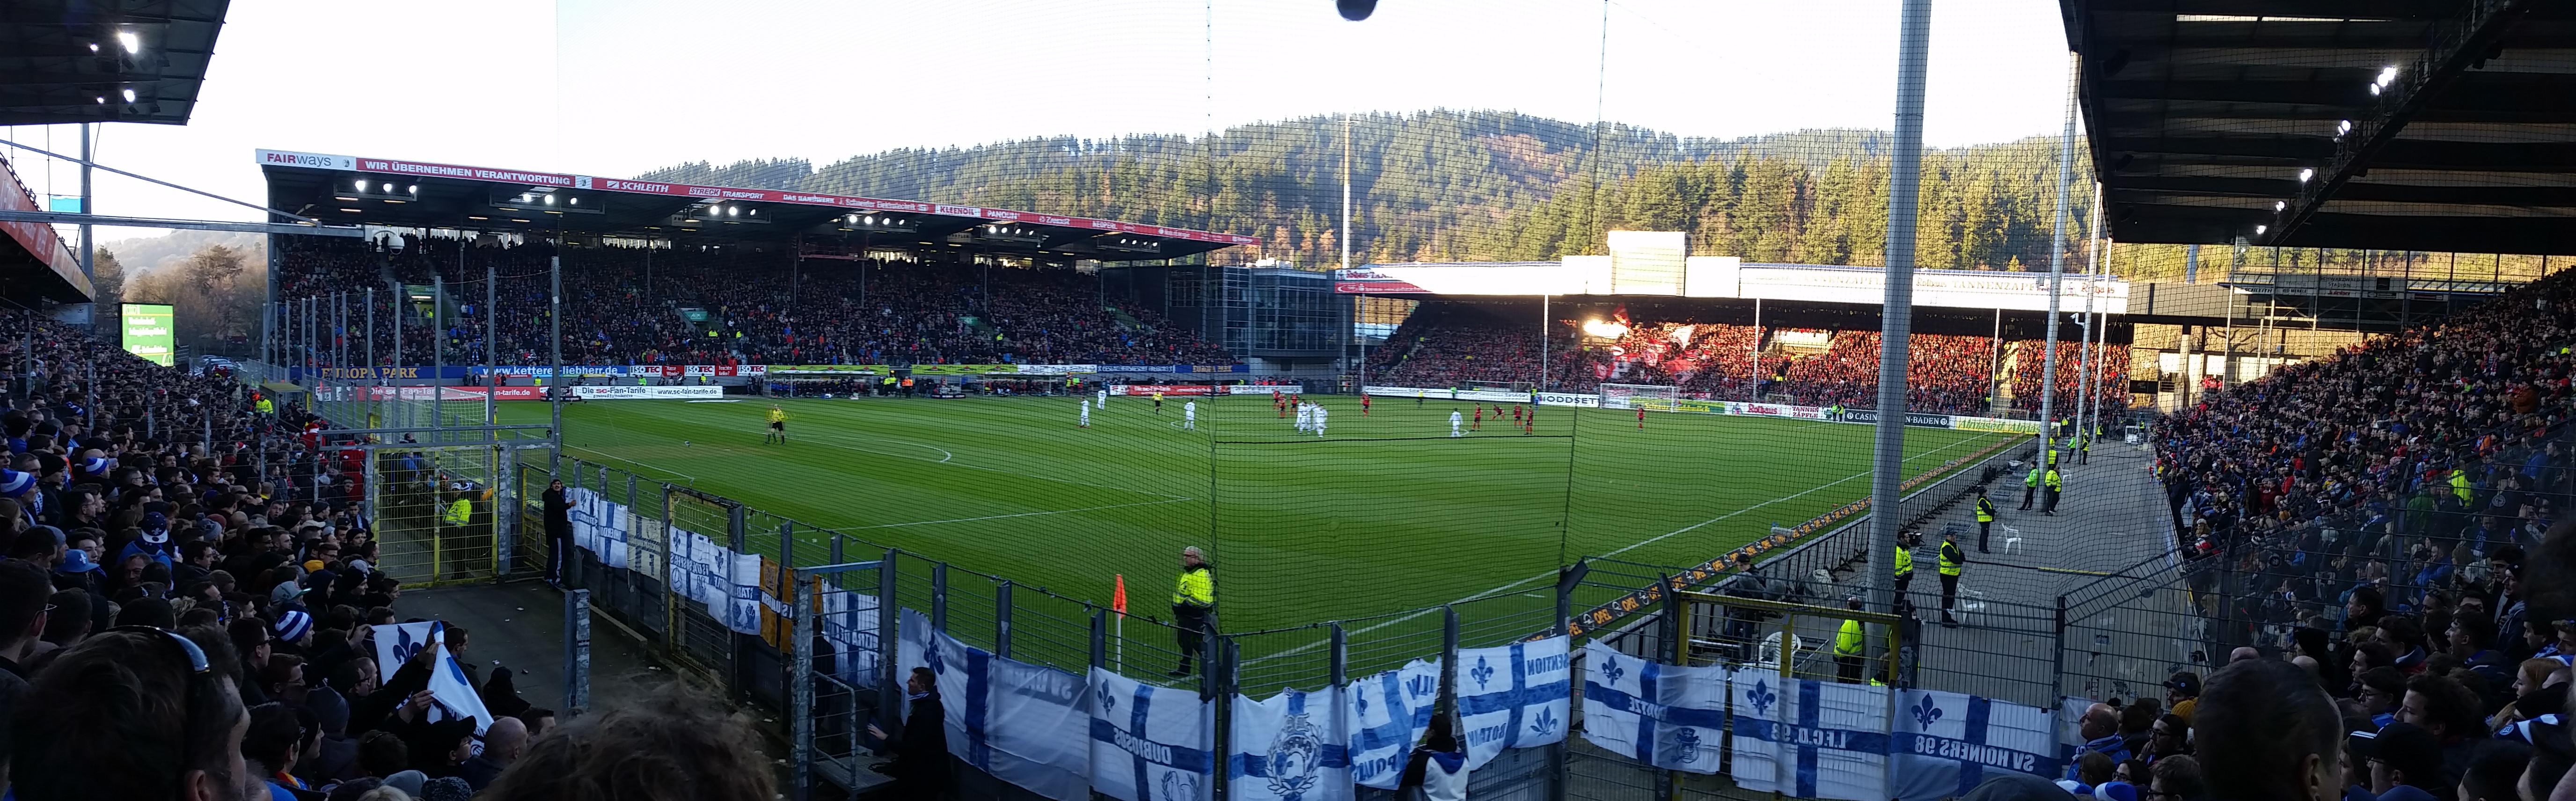 SC Freiburg vs Darmstadt 98 - 10.12.2016